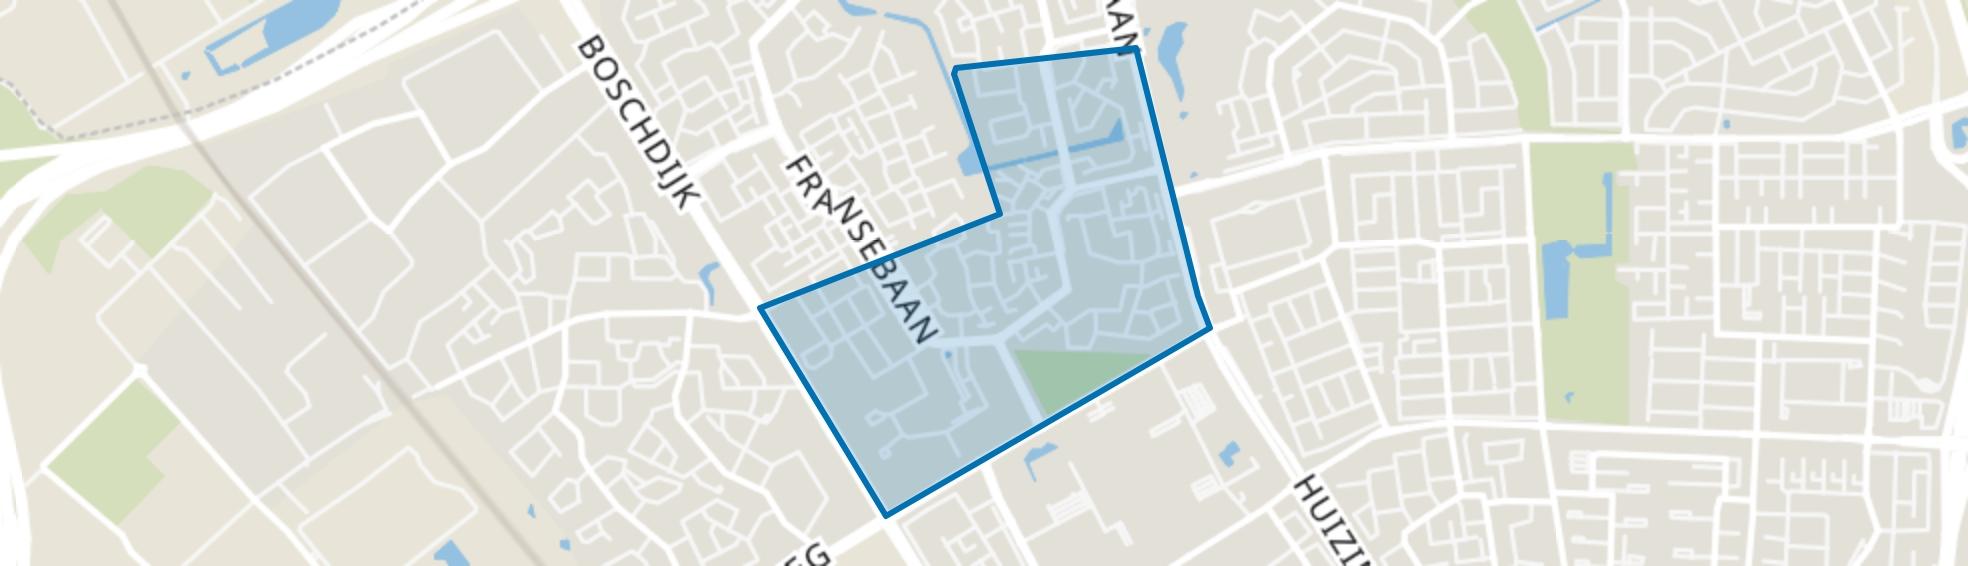 Achtse Barrier-Gunterslaer, Eindhoven map